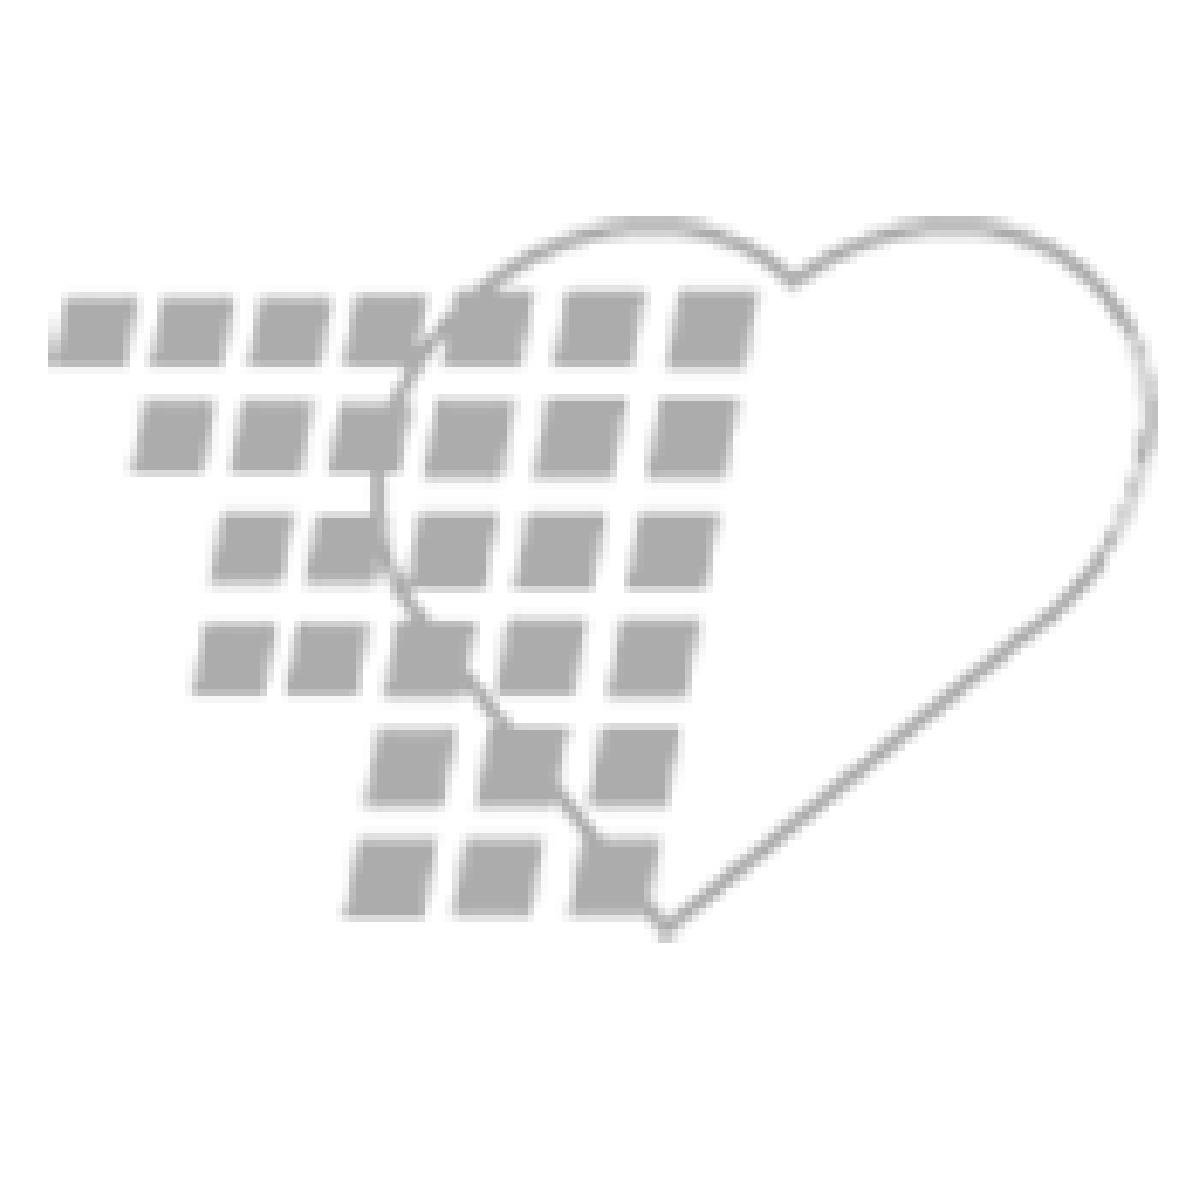 12-85-8020 Innovative Healthcare Corporation DermAssist® Baby Wipes